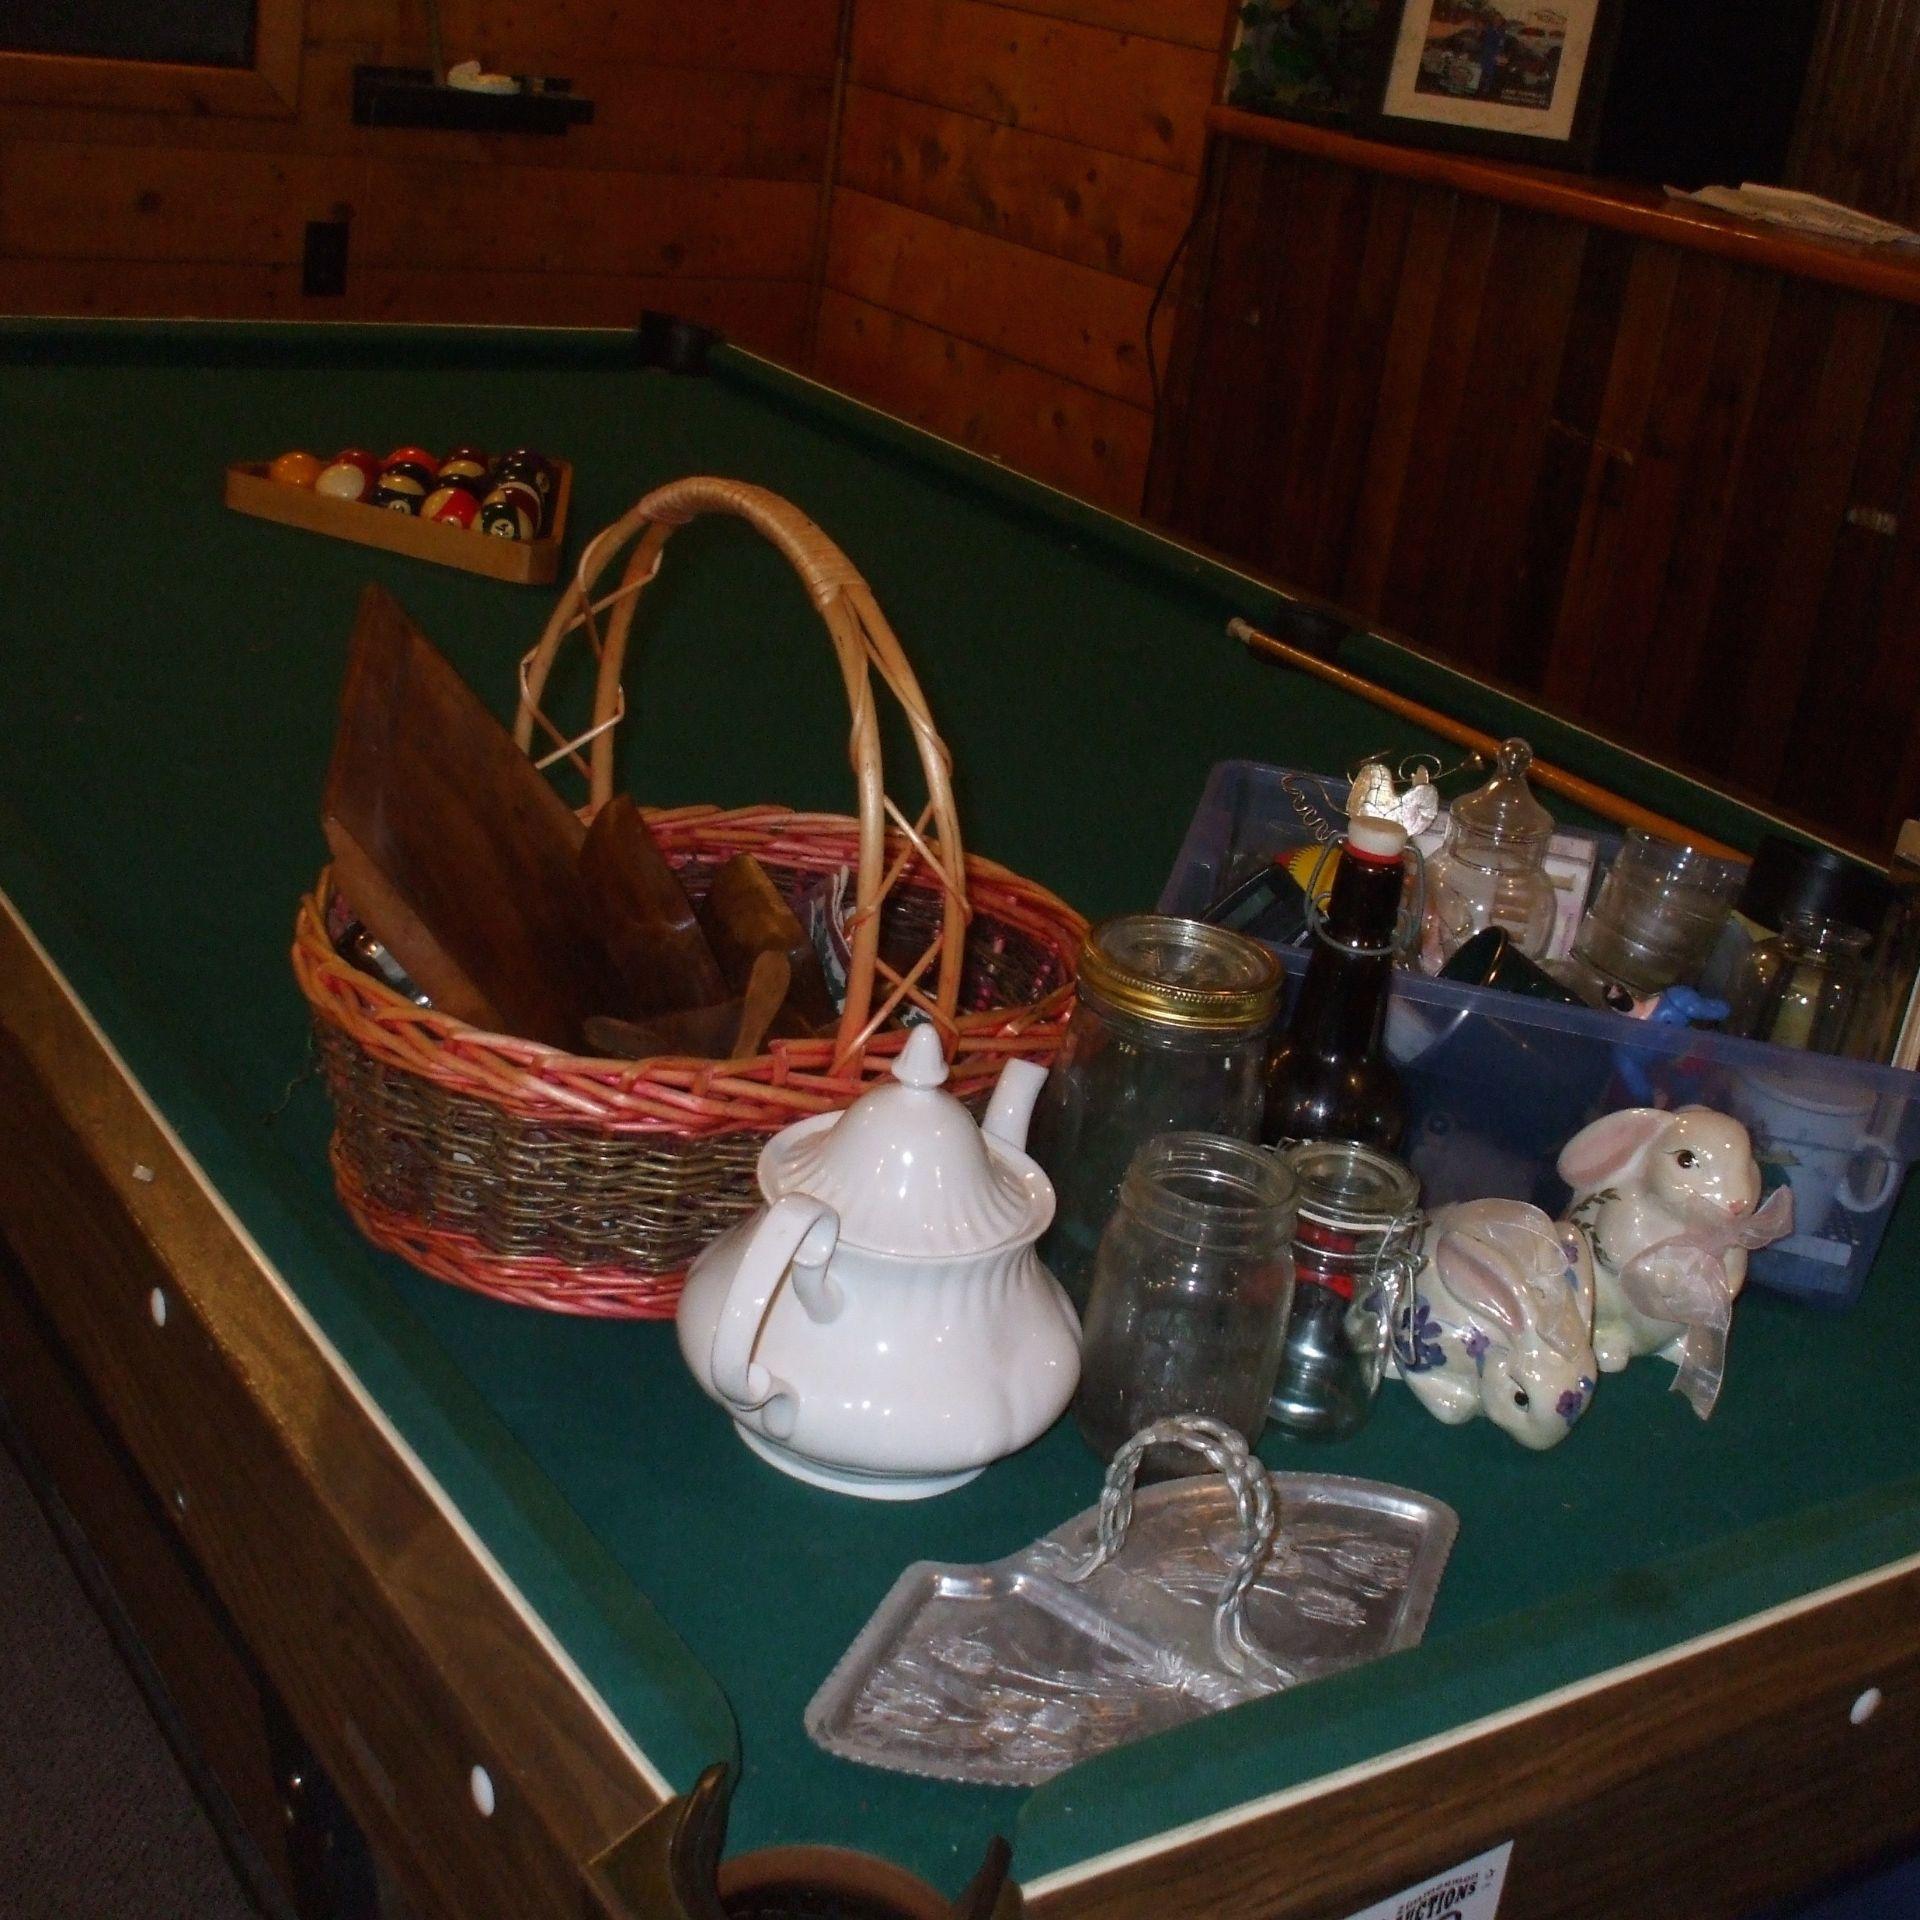 Misc. kitchen gadgets, teapot, baskets - Image 2 of 2